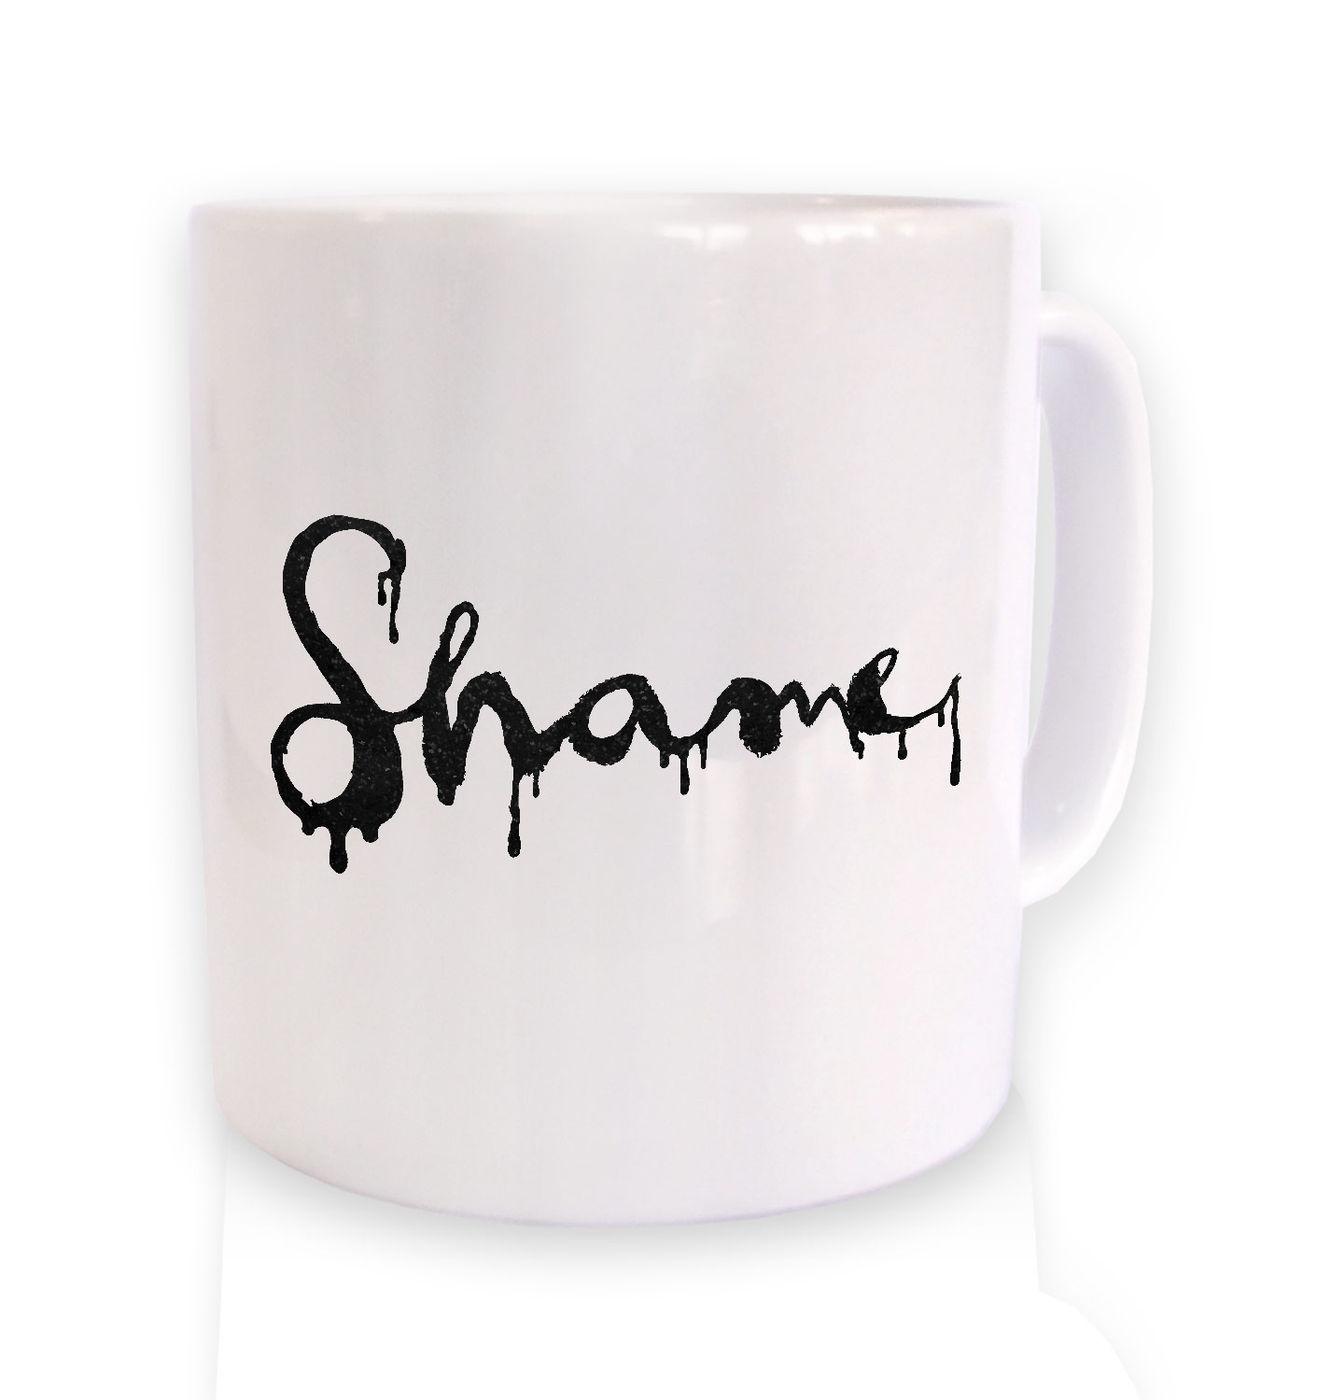 Shame mug by Something Geeky